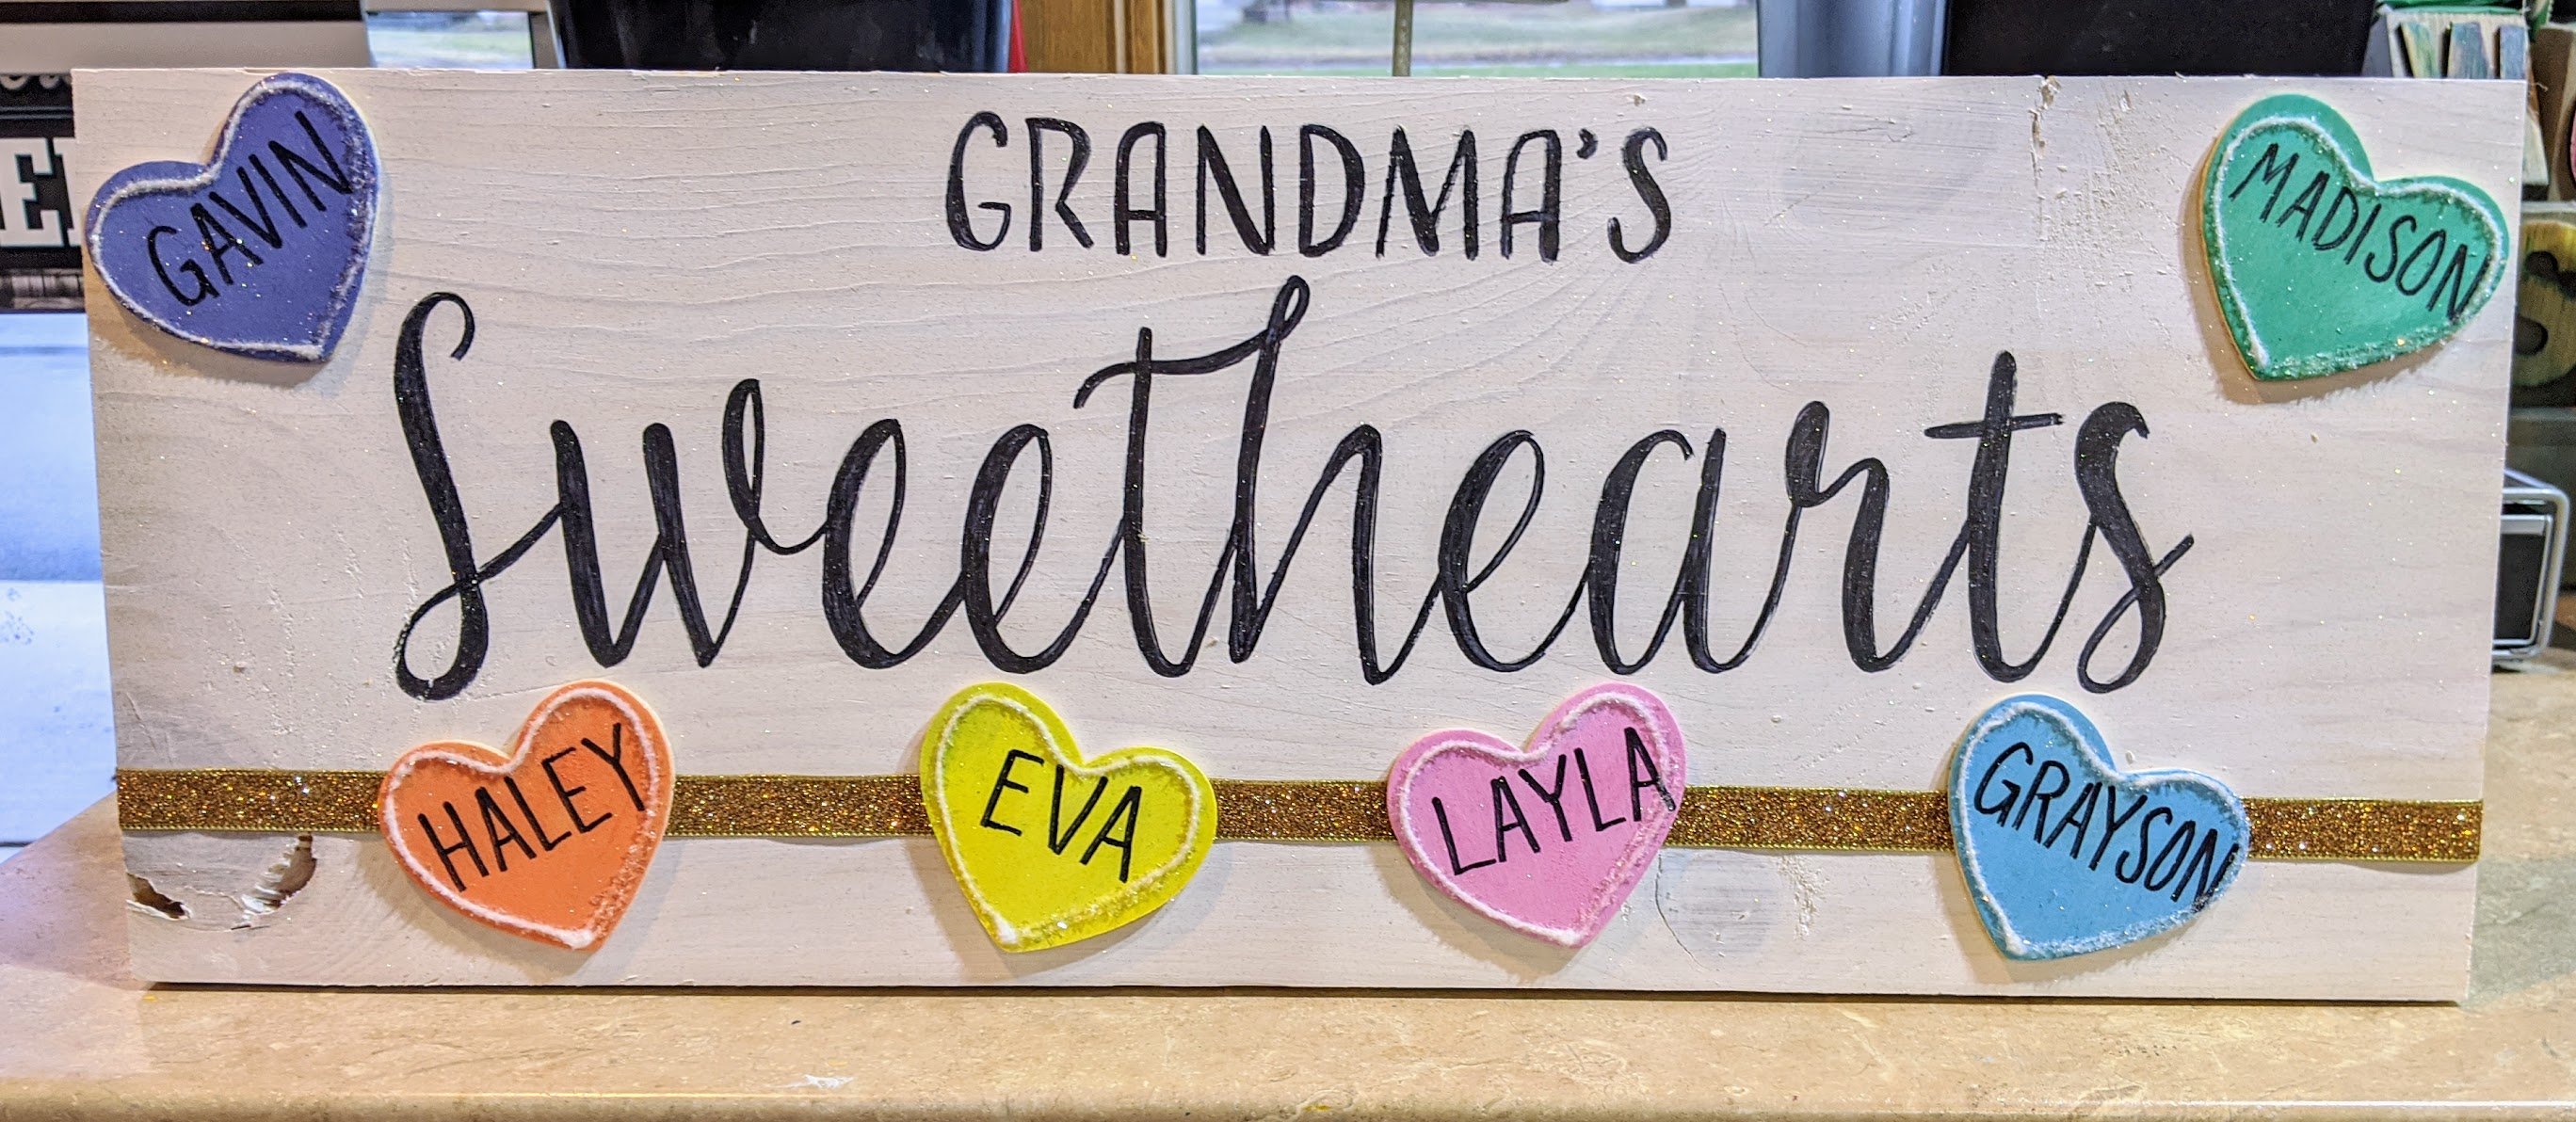 Grandma's Sweethearts